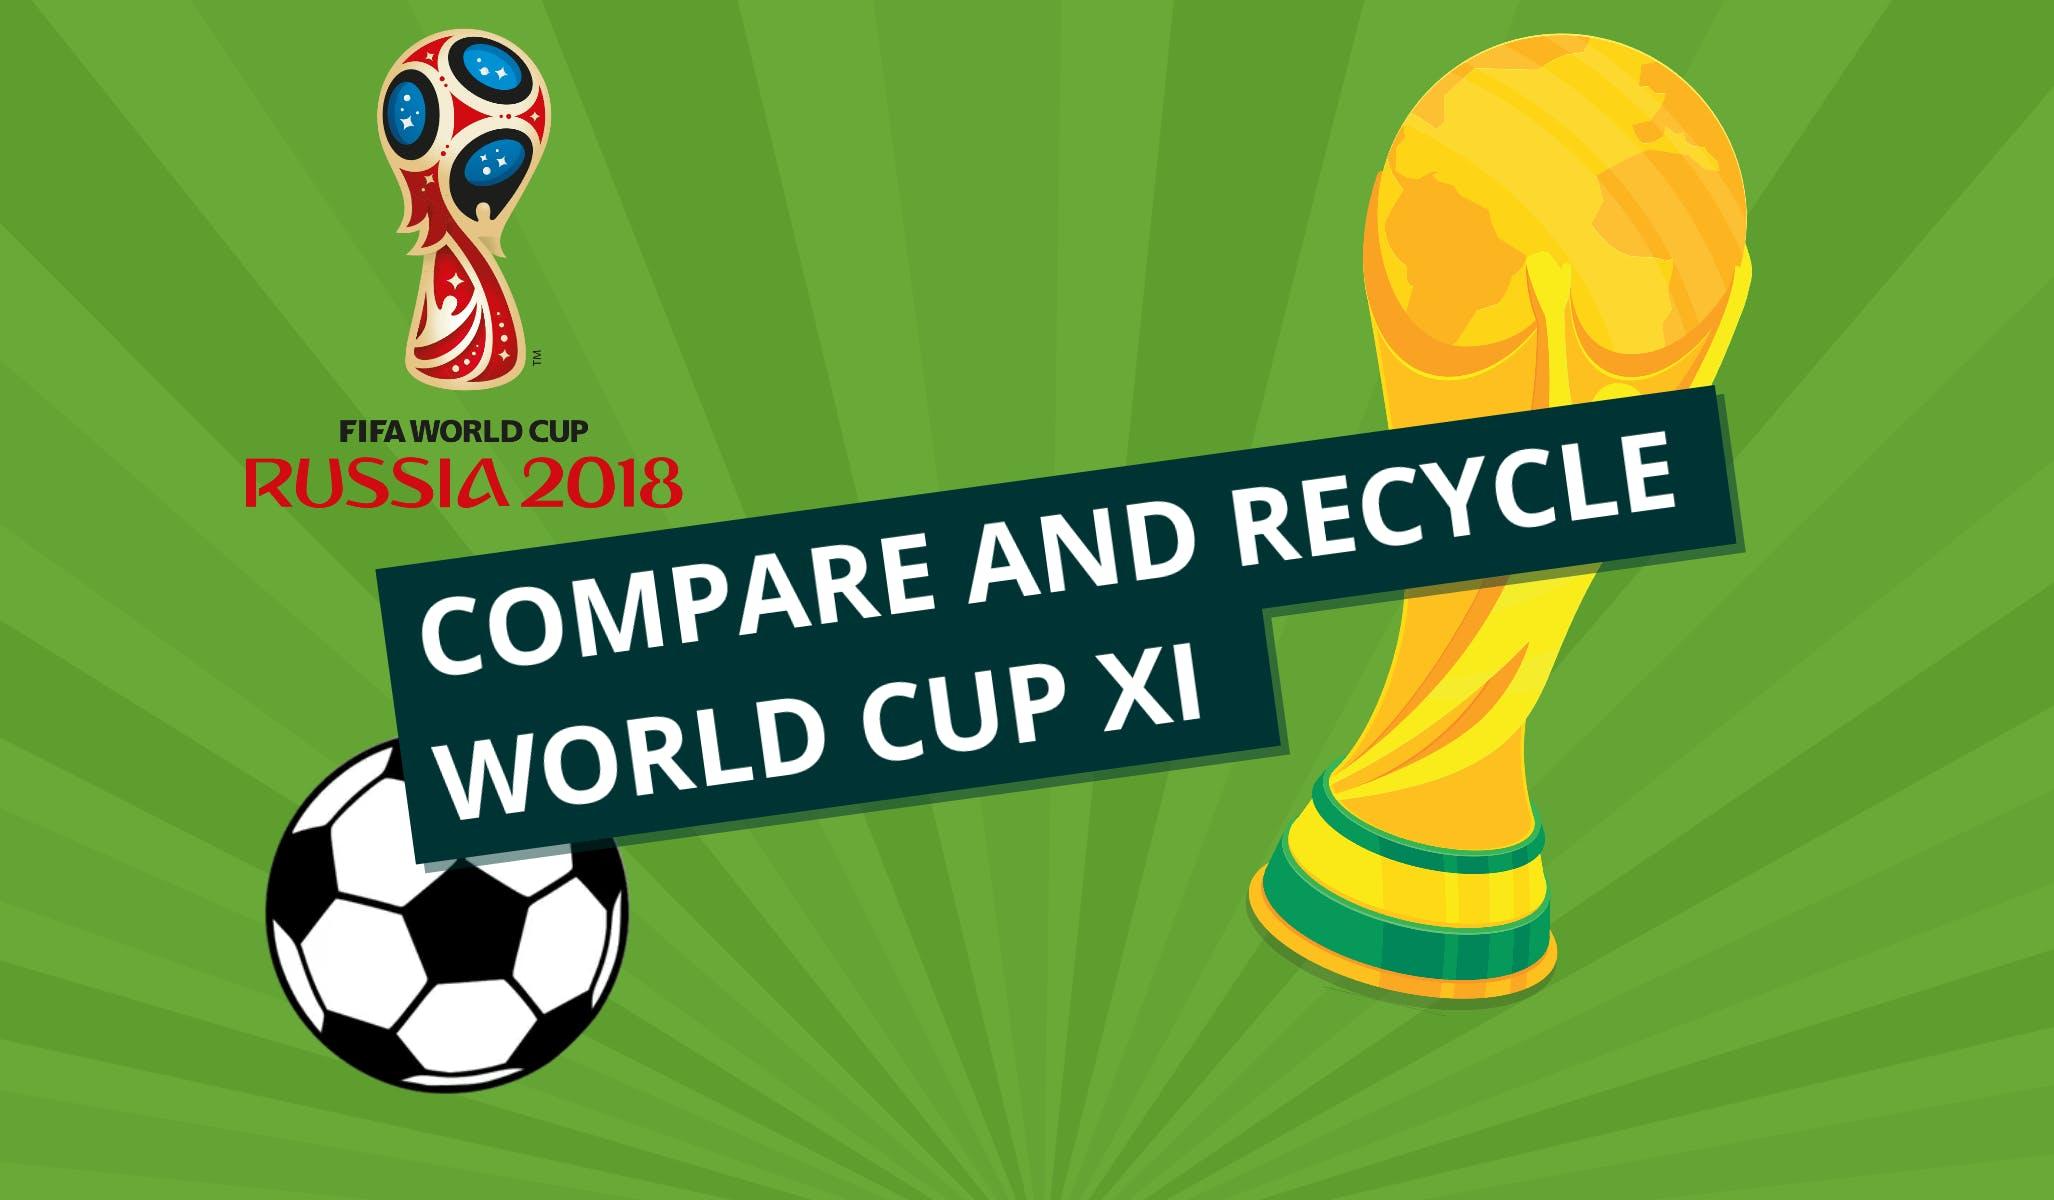 PHONE THEME WORLD CUP XI